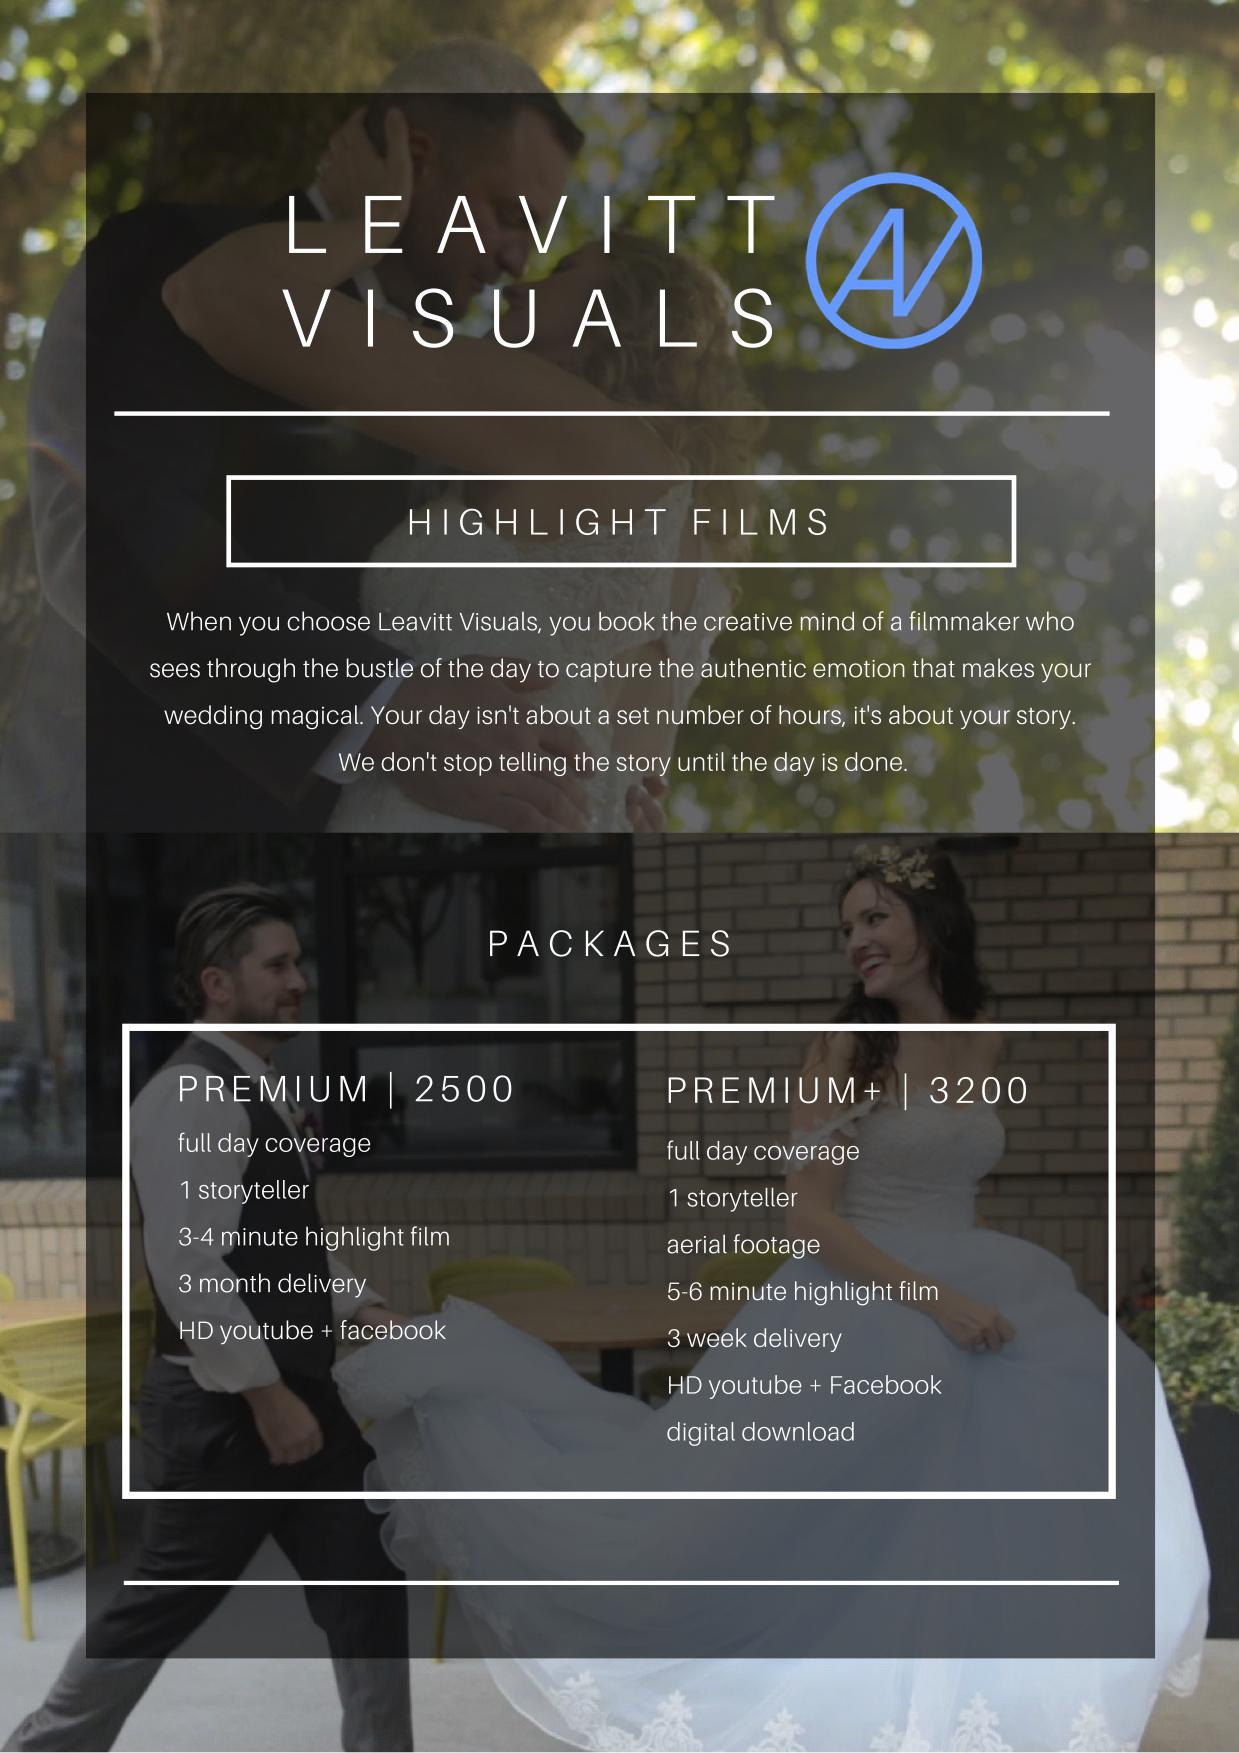 Leavitt_Visuals_Price_List_1.jpg